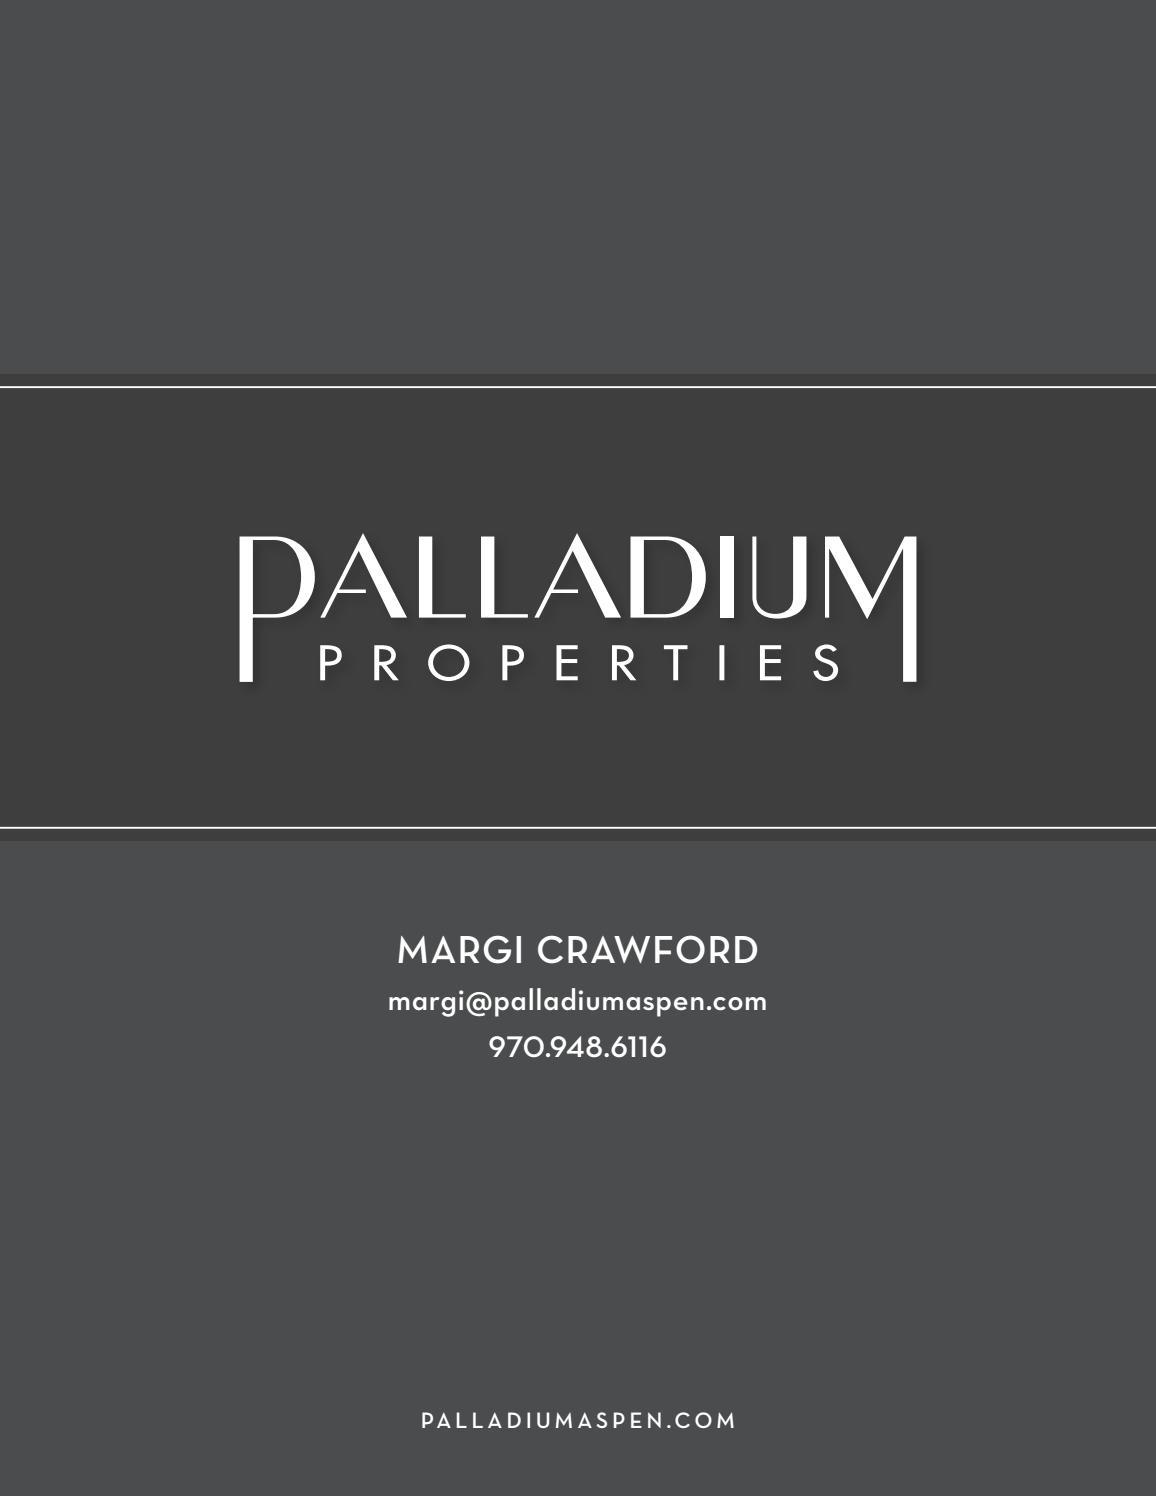 Margi Crawford + Palladium Properties by SSF RFV - issuu